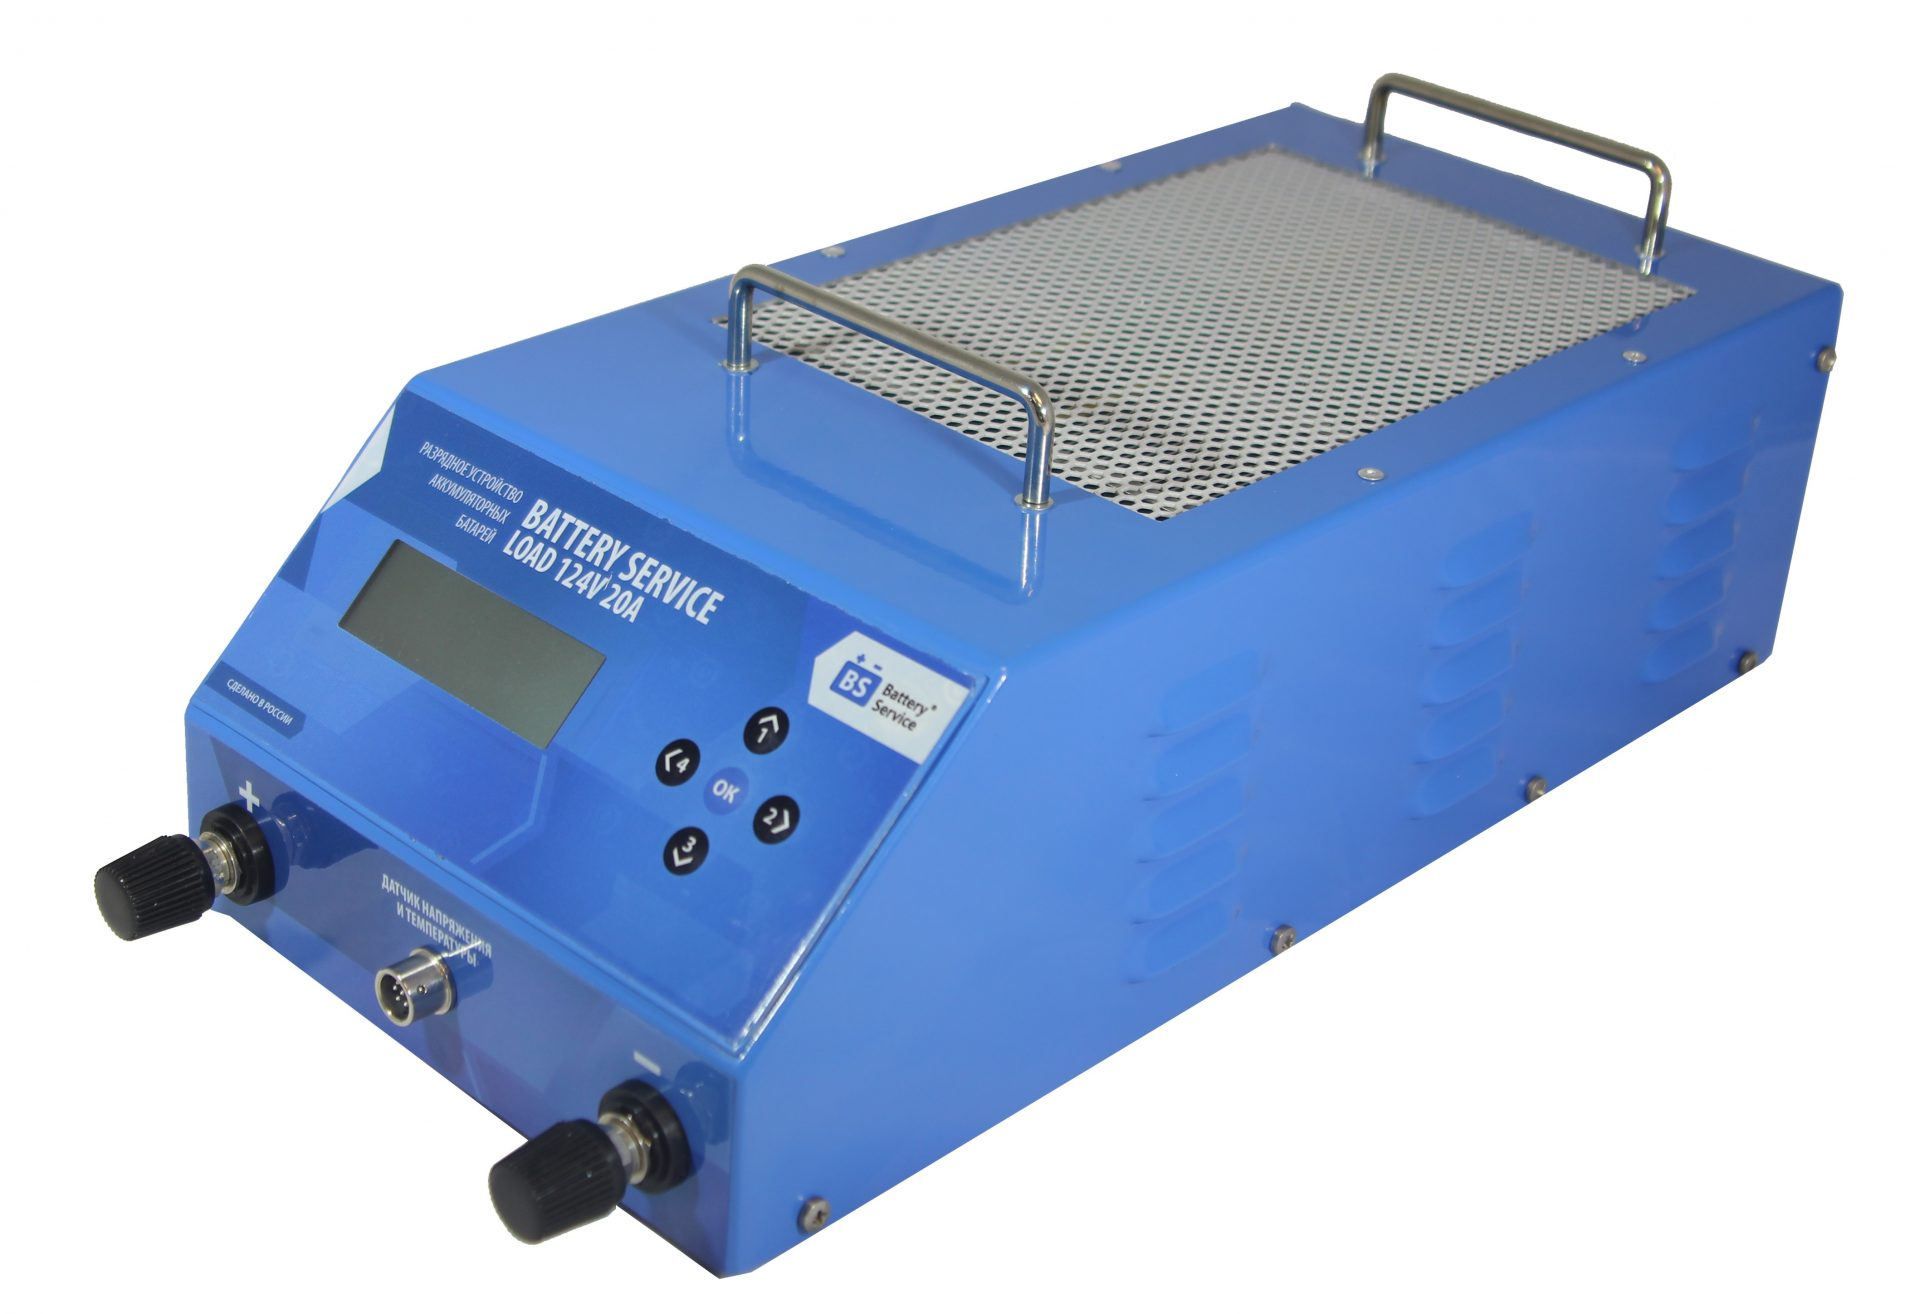 BSL-120/20 Разрядное устройство Battery Service Load 120В 20А